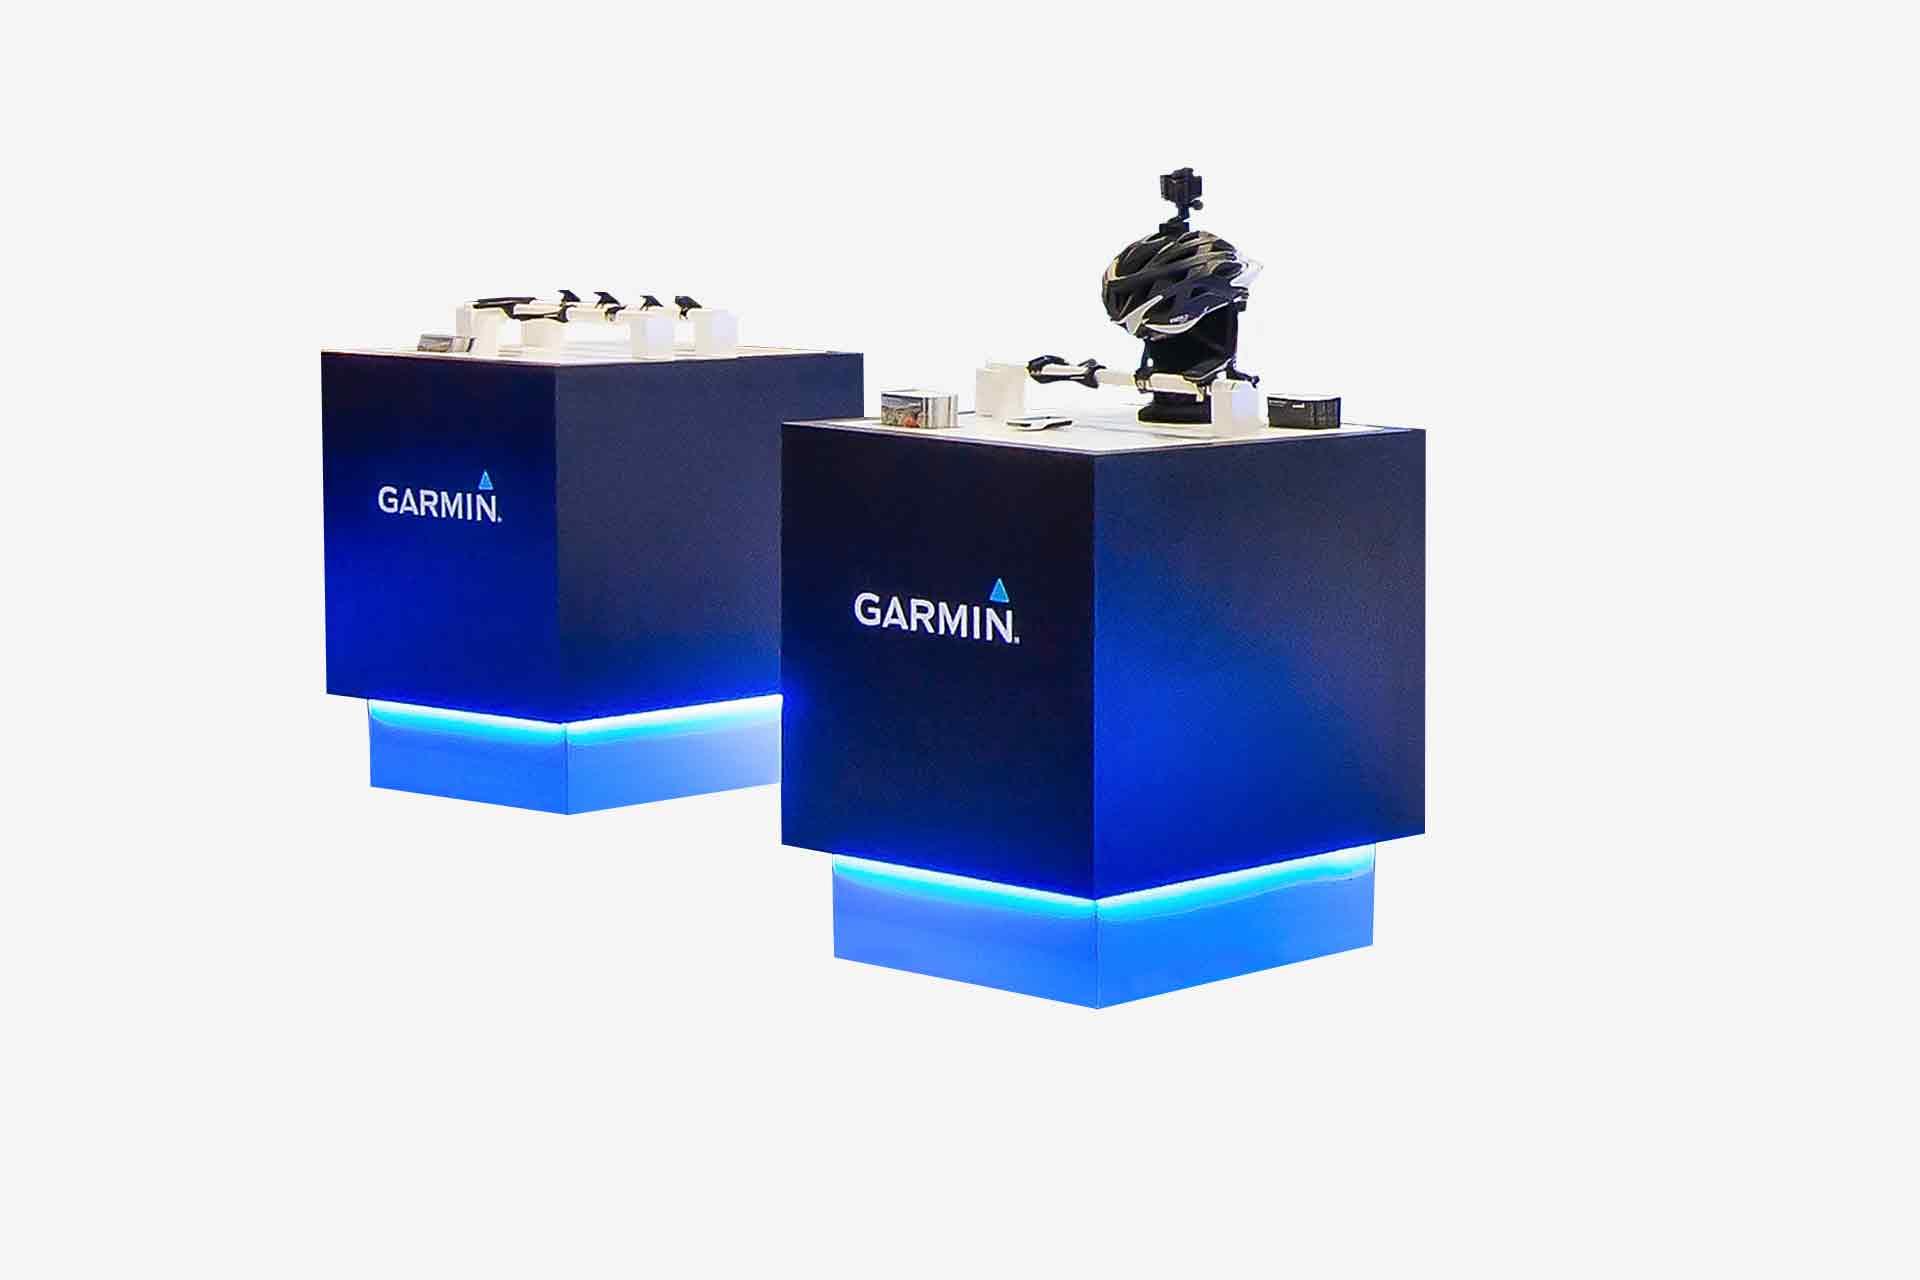 Garmin display